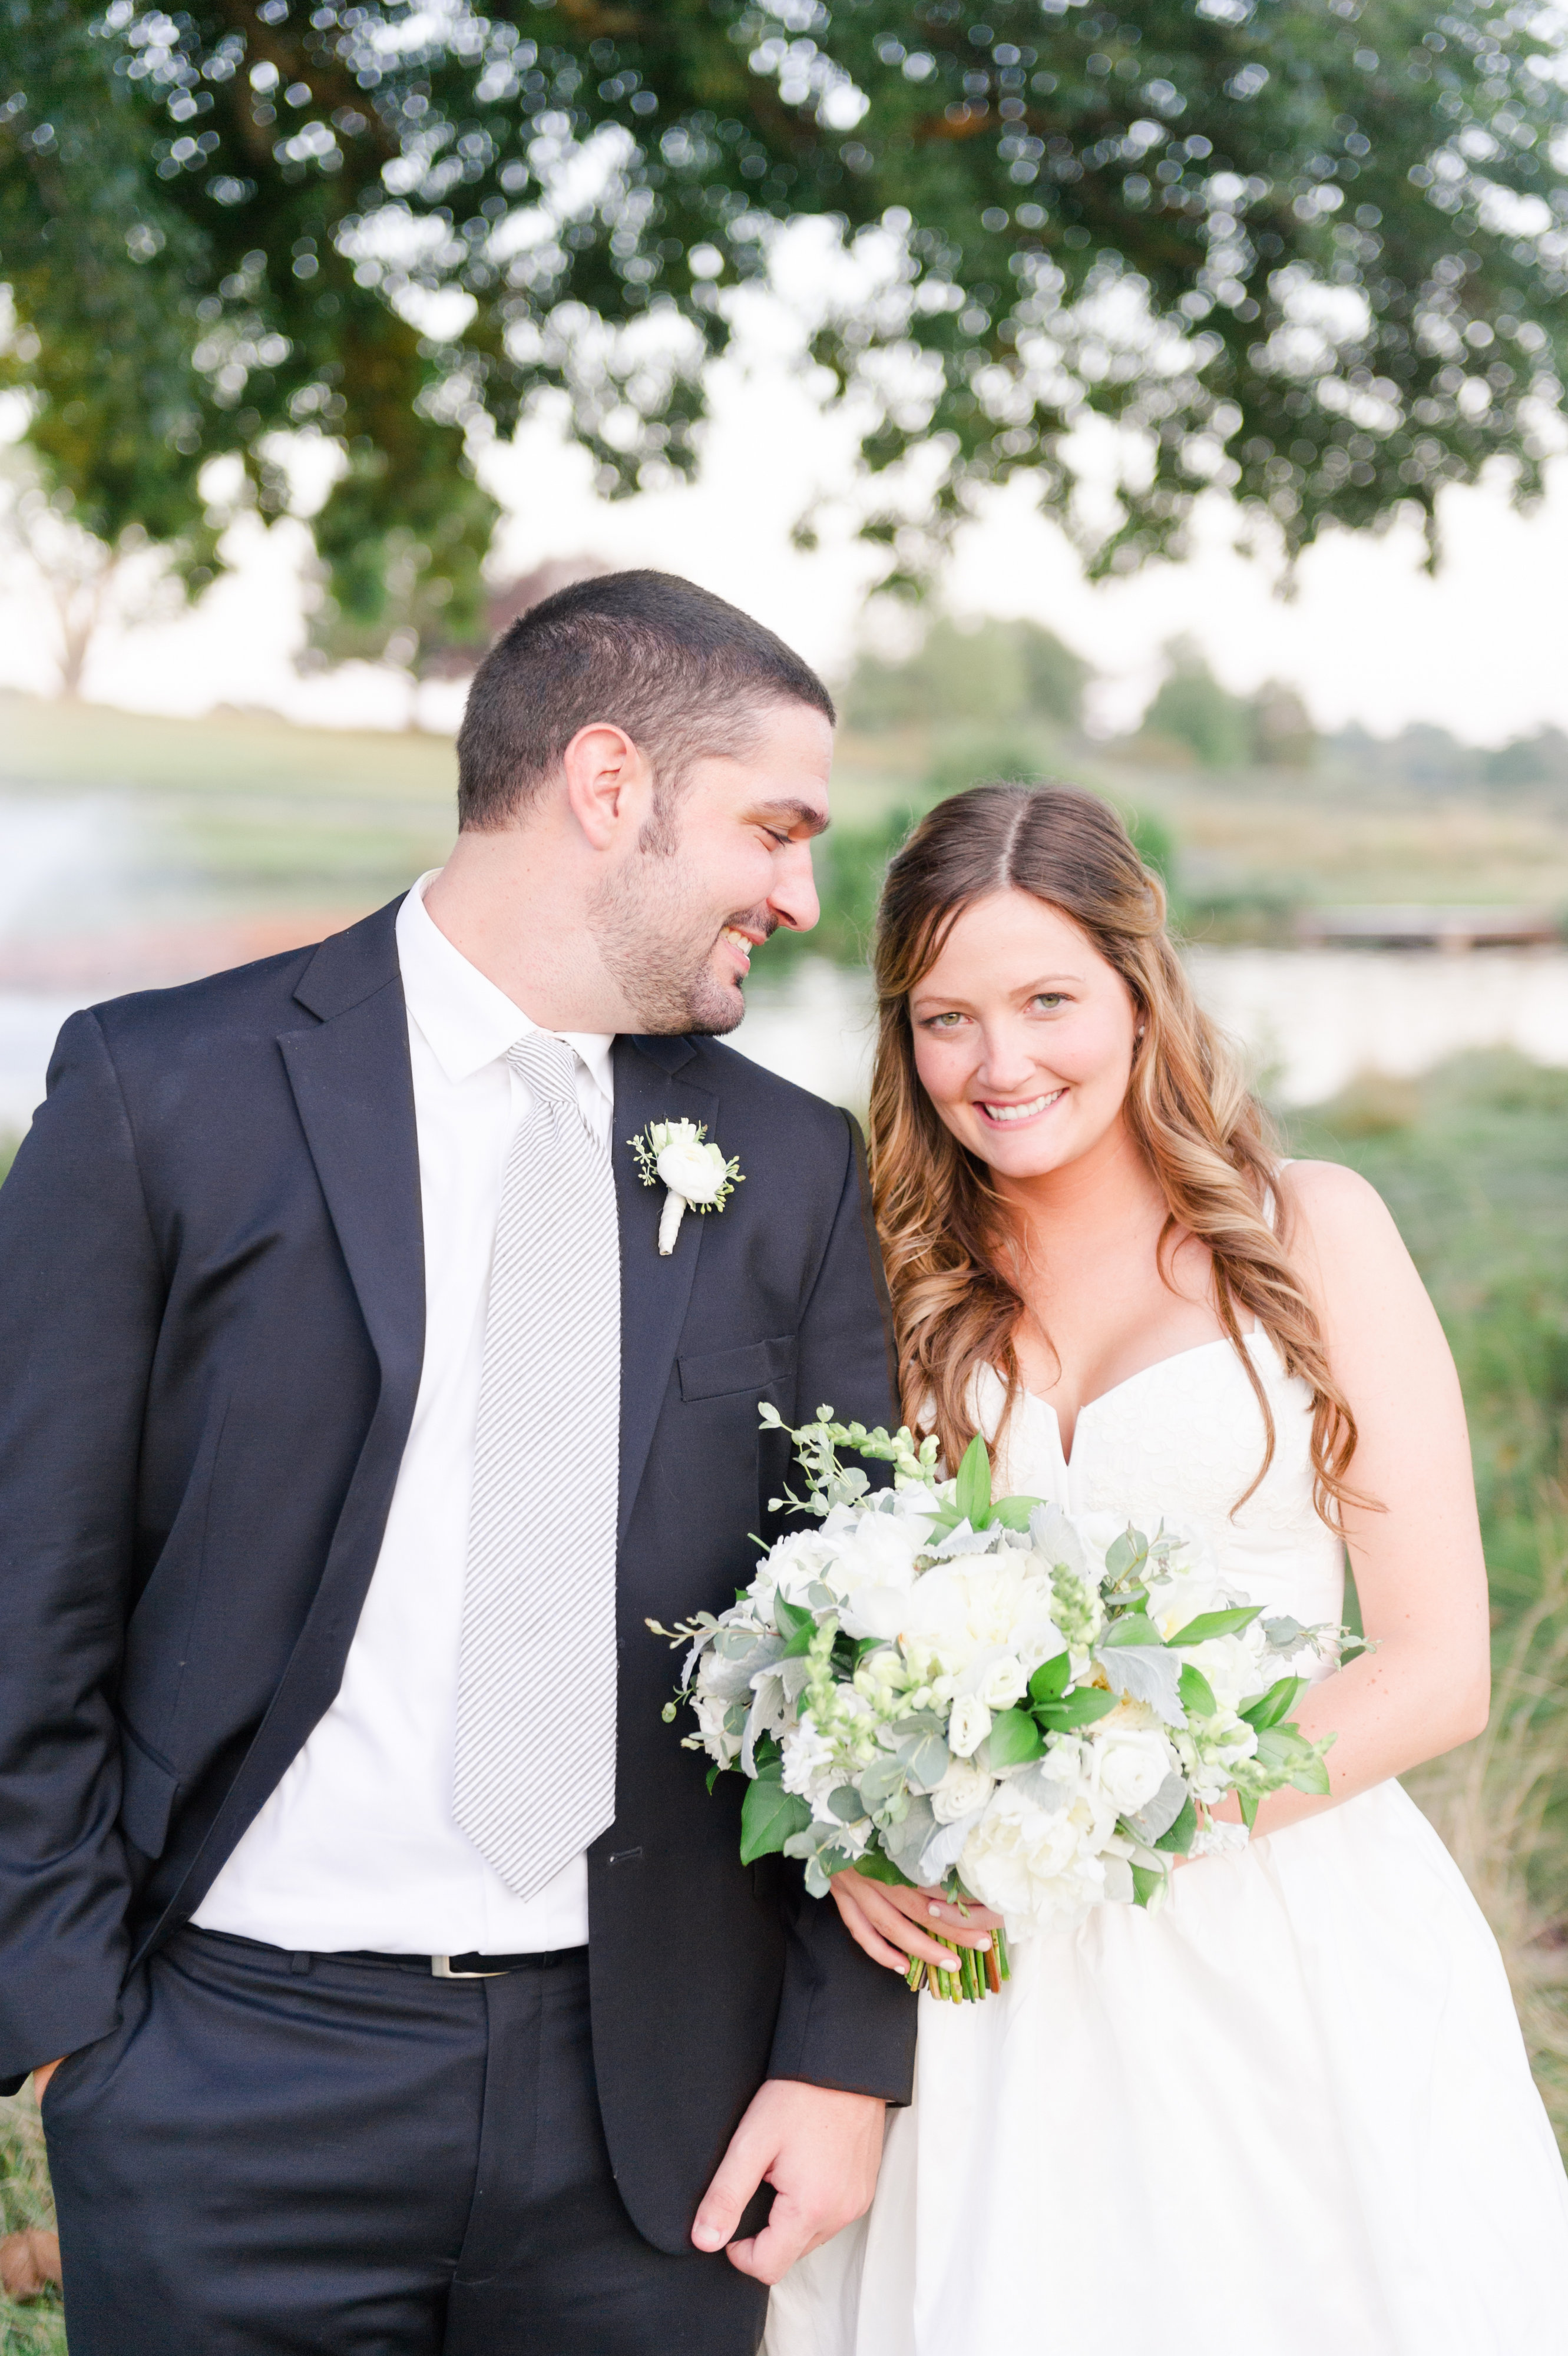 Keswick hall wedding in charlottesville virginia for Wedding dresses charlottesville va